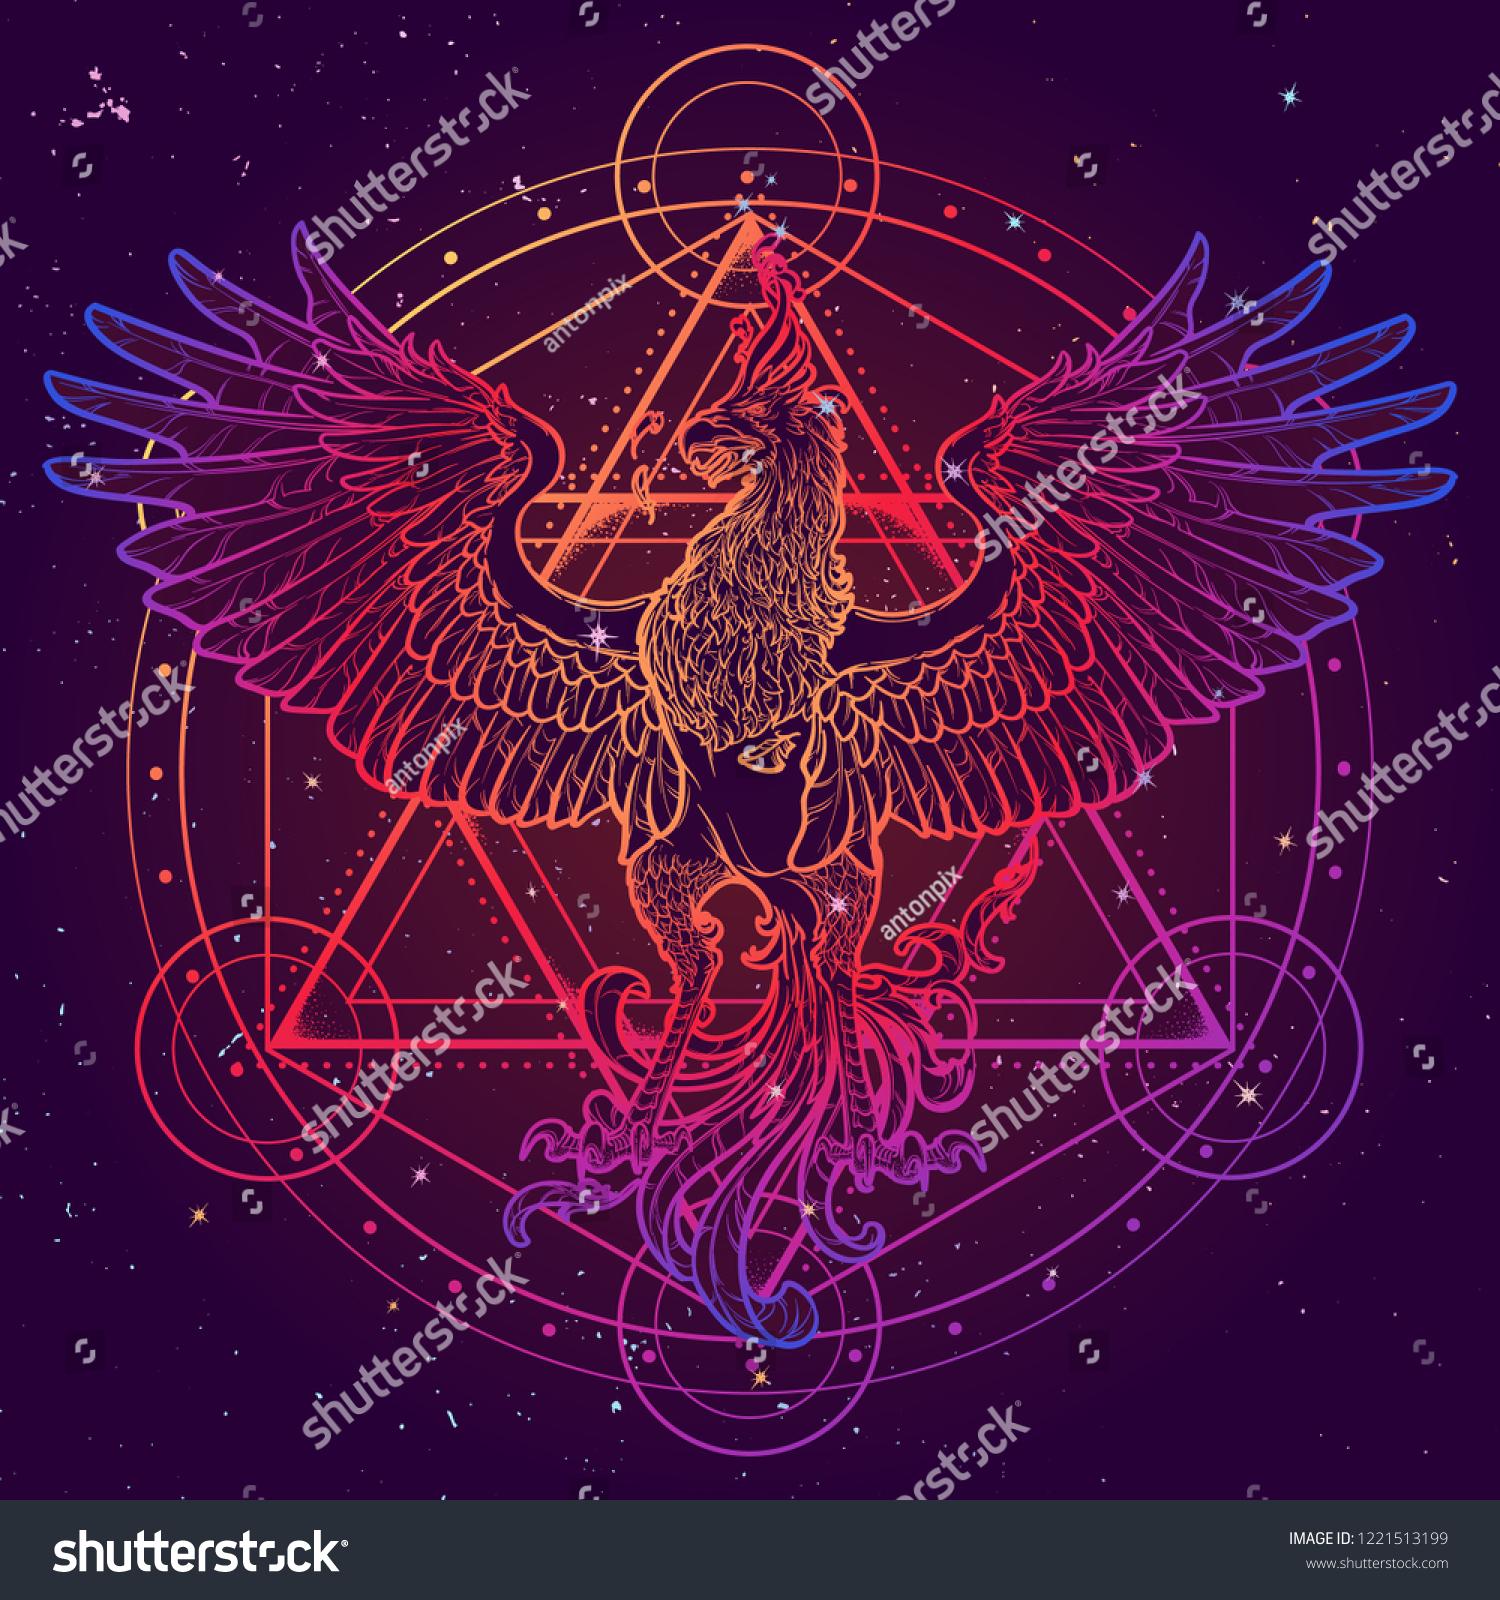 Mythycal Bird Phoenix Davids Star On Stock Vector (Royalty Free) 1221513199